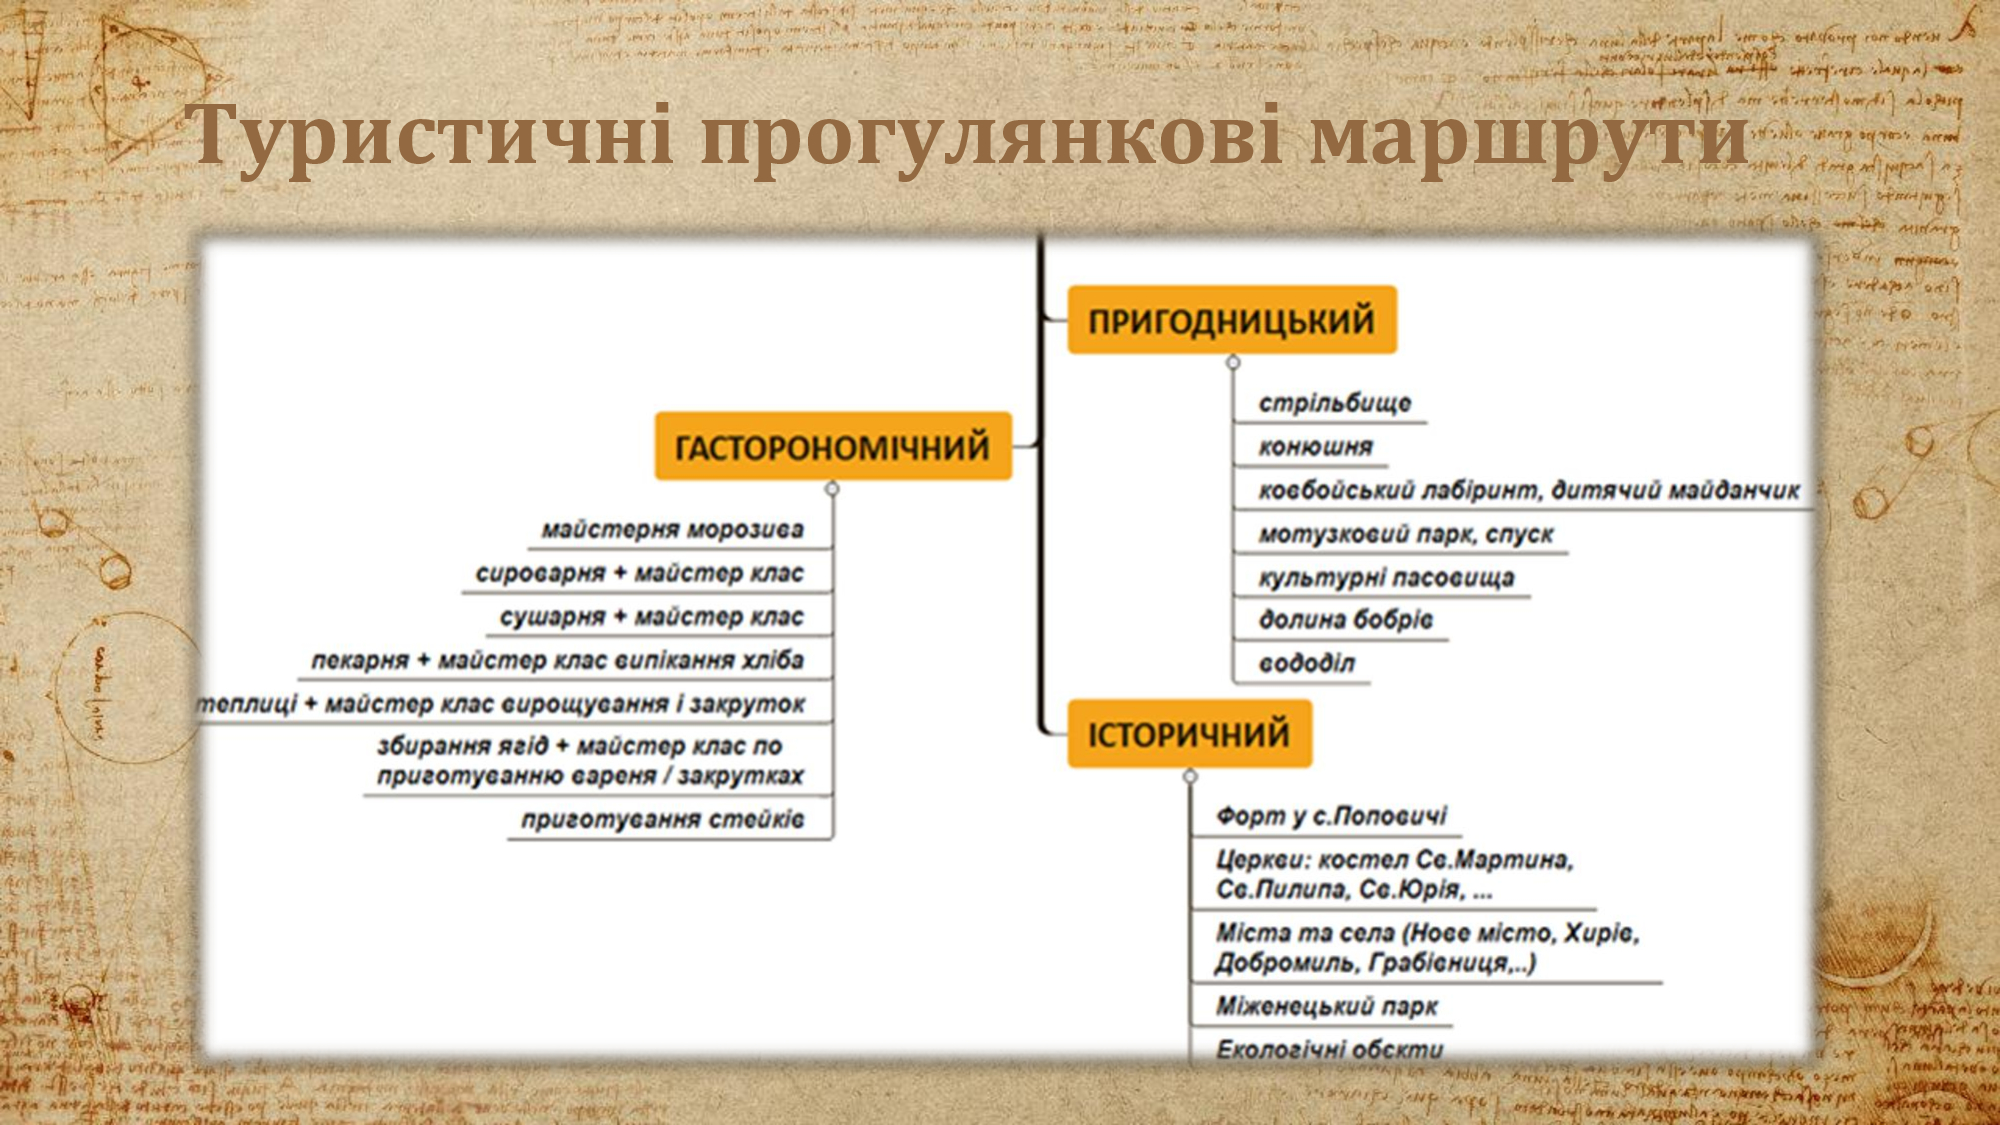 content_1456035_1508476.jpg